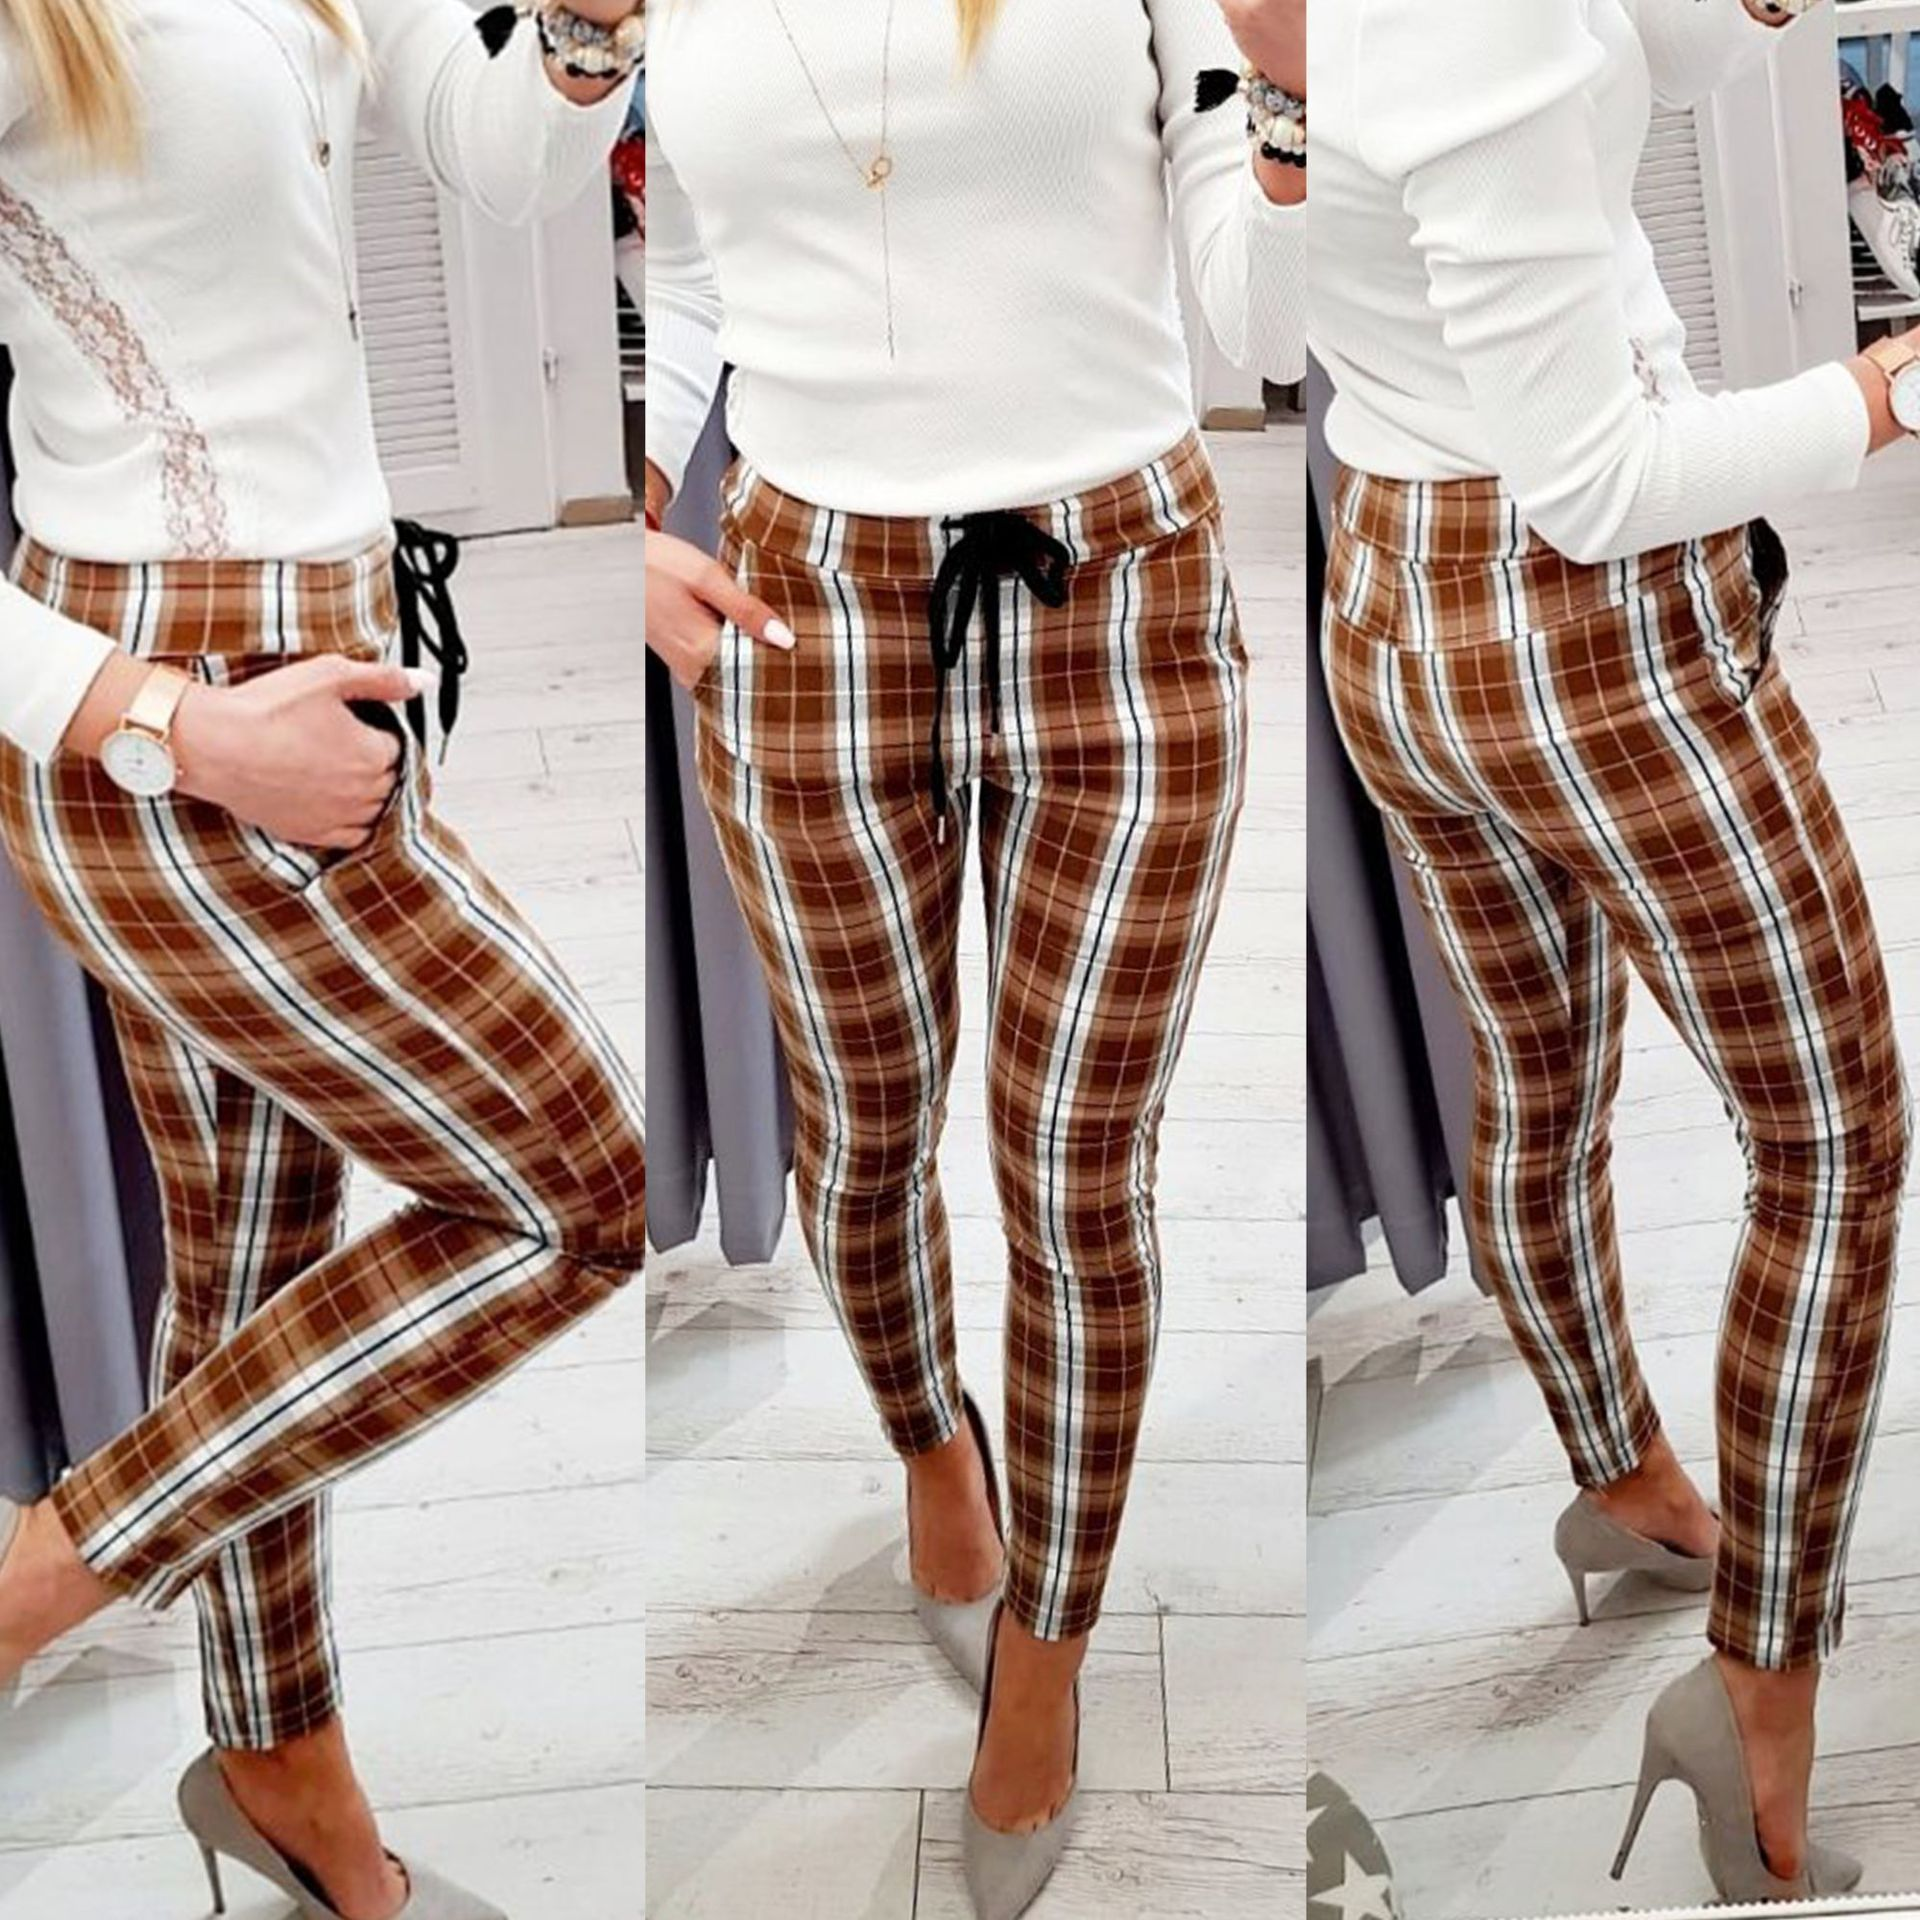 Fashion Casual Skinny Plaid Printed Elastic Waist Women Trousers Skinny Plaid Pants Women Streetwear  High Waist Pants